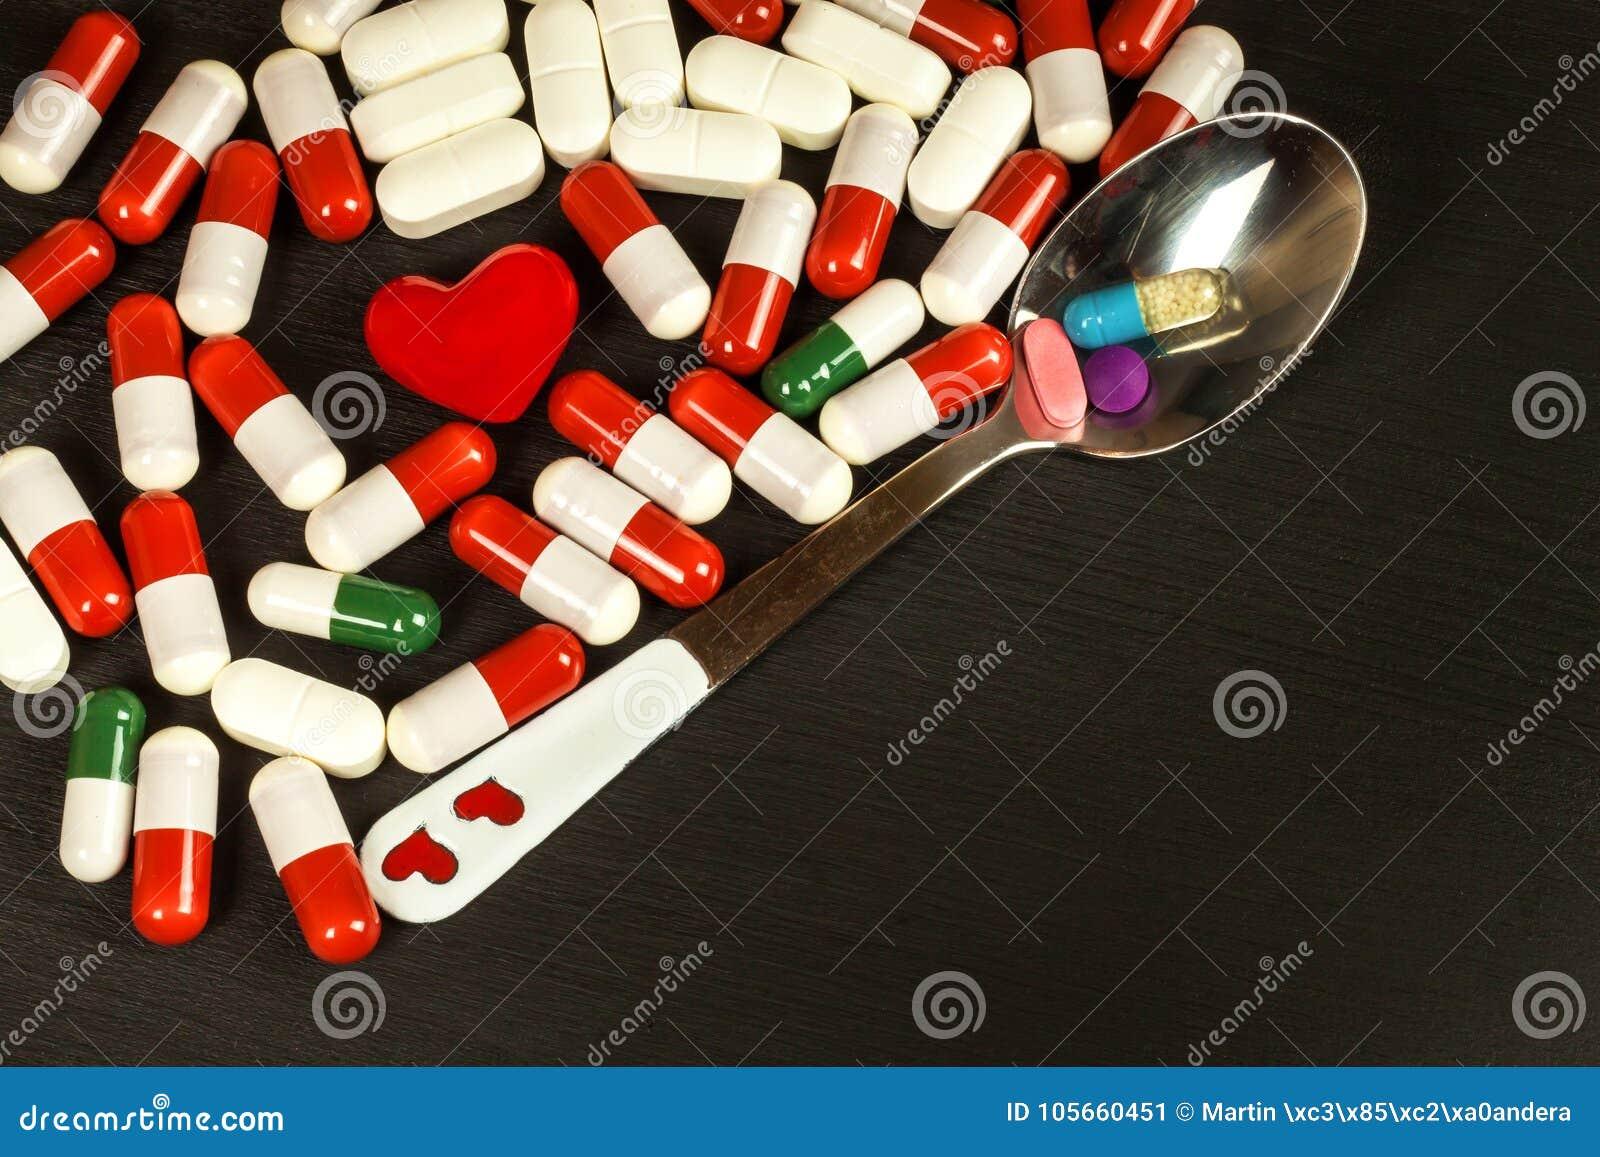 esteroides comunes in 2021 – Predictions